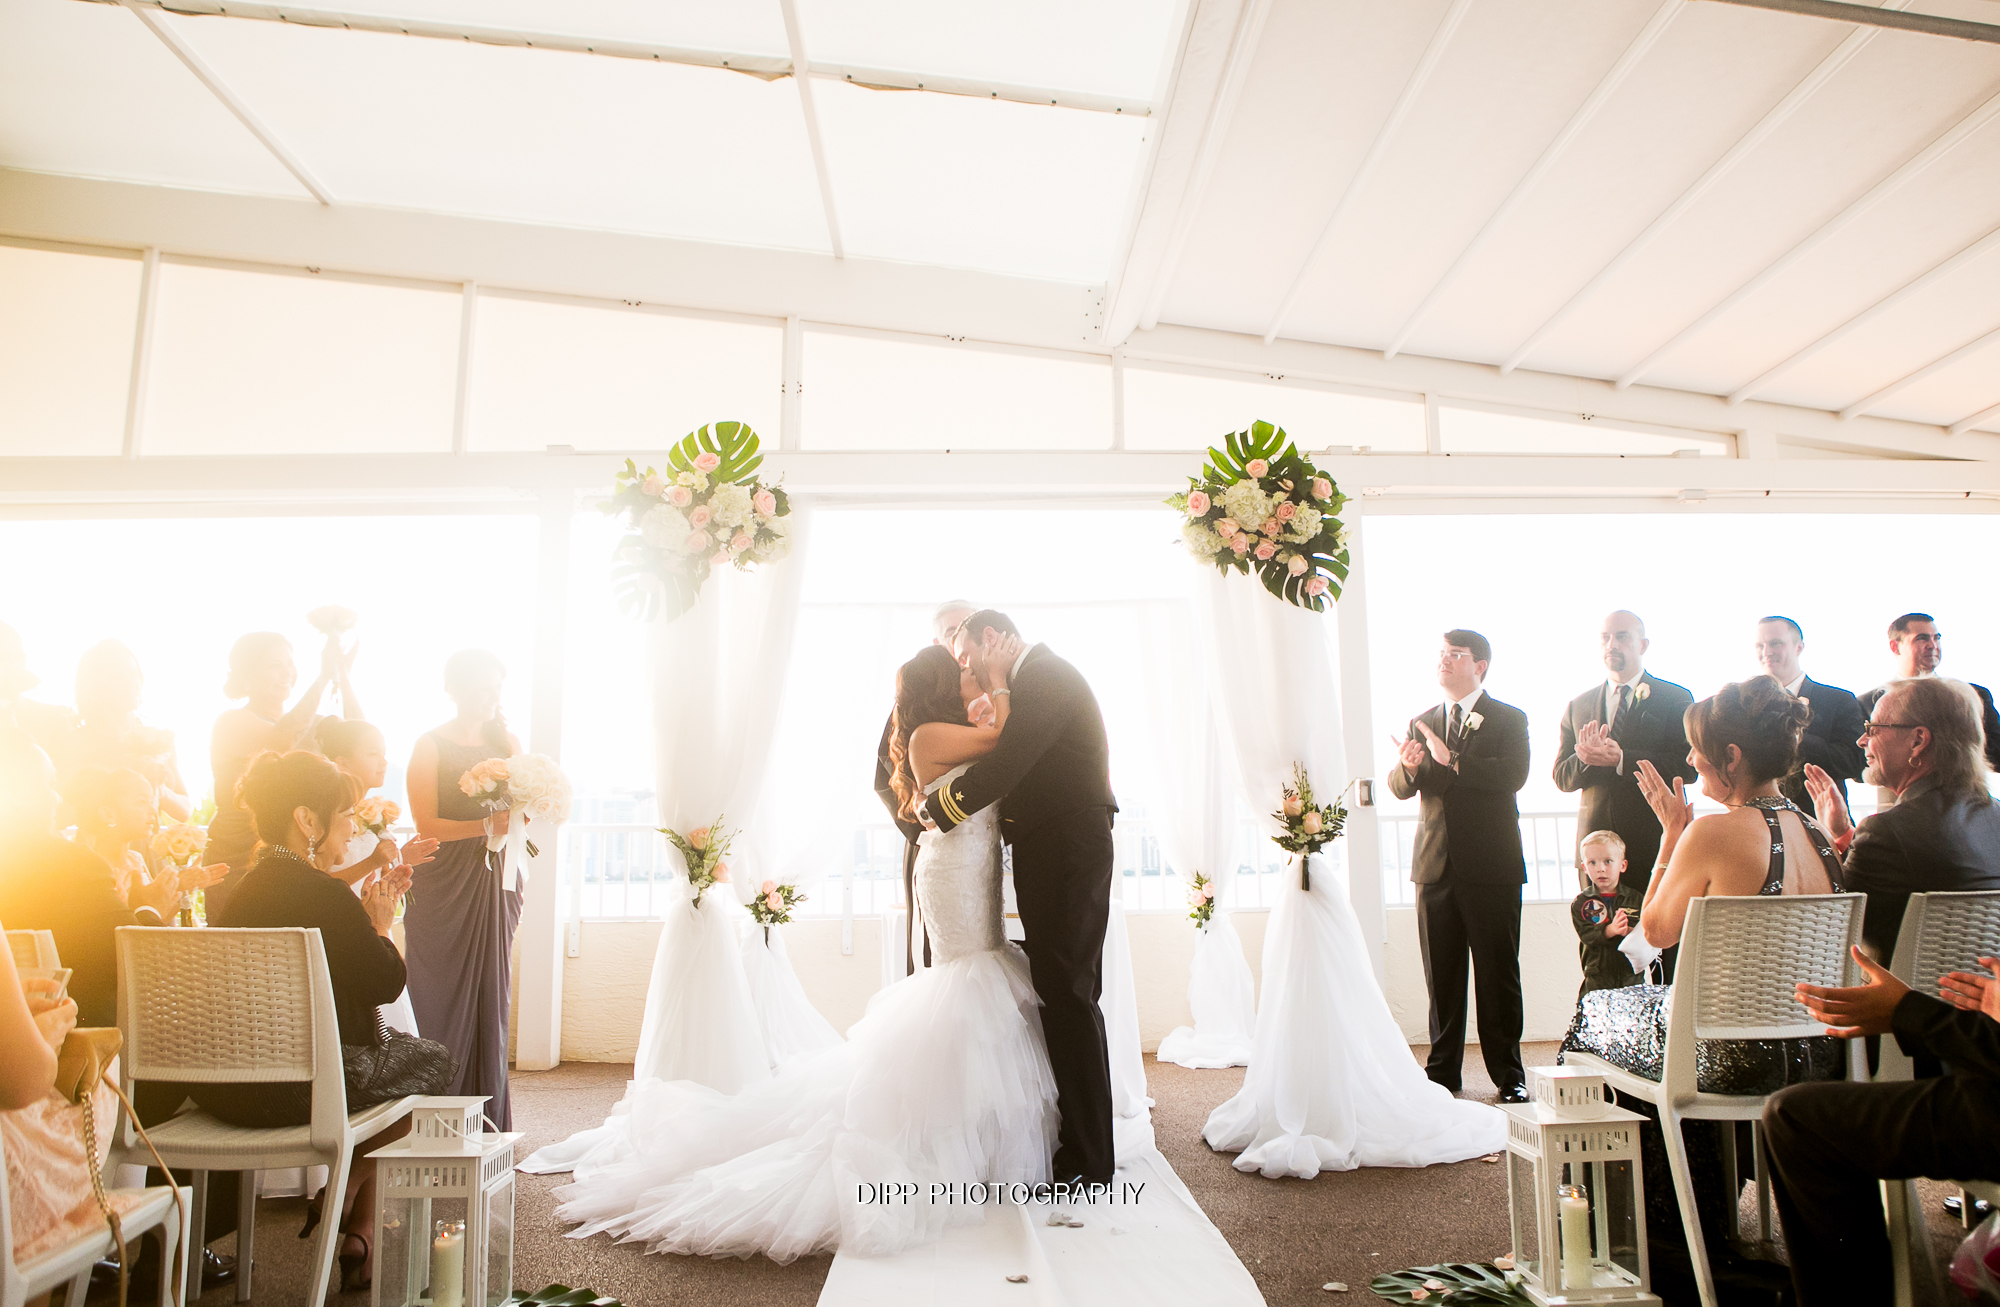 Dipp_2016 EDITED Sara & Brandon Wedding-271